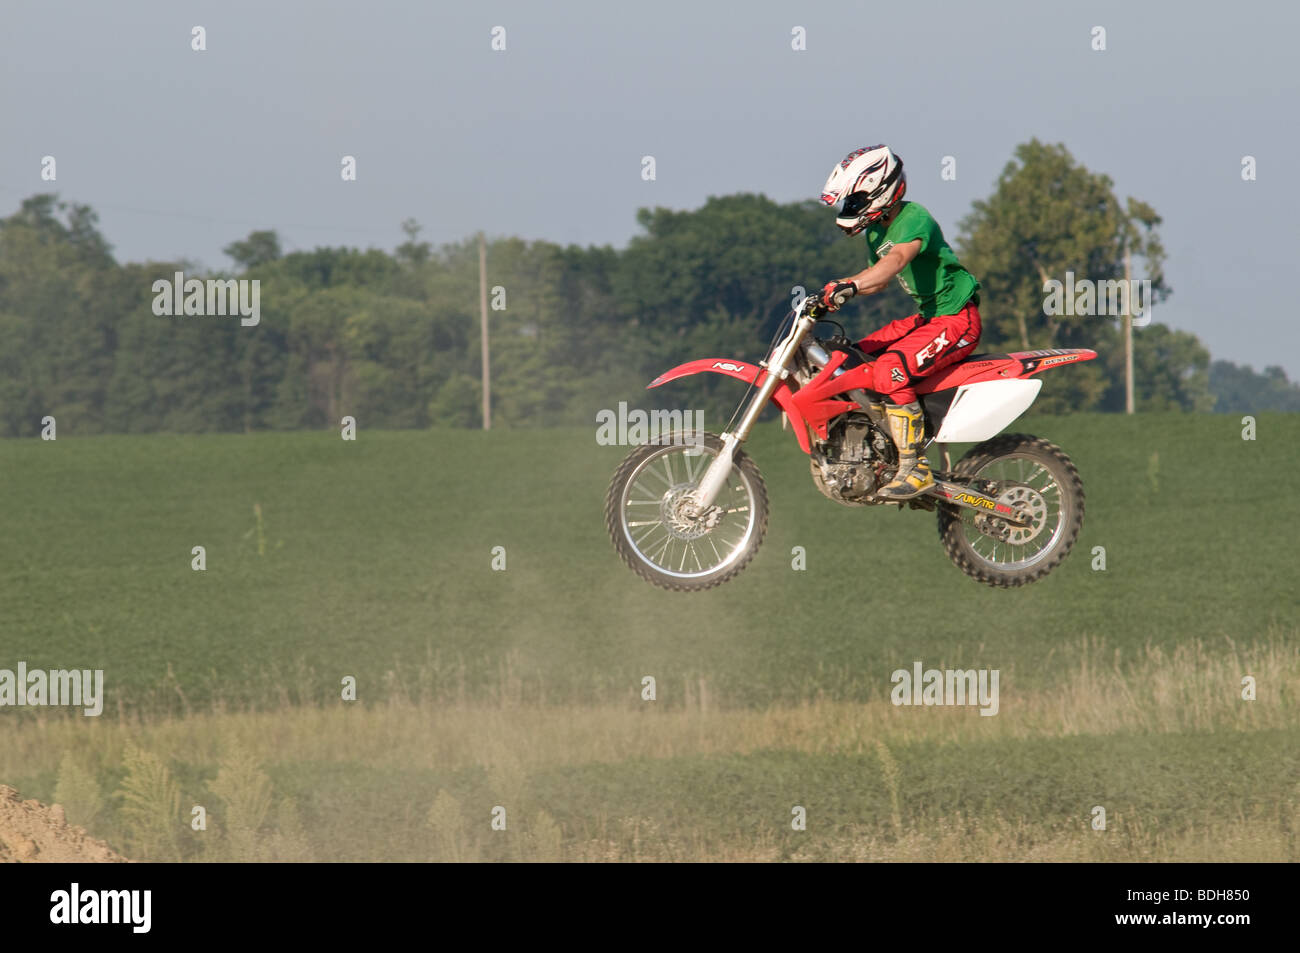 Dirt bike riding in Ohio USA - Stock Image